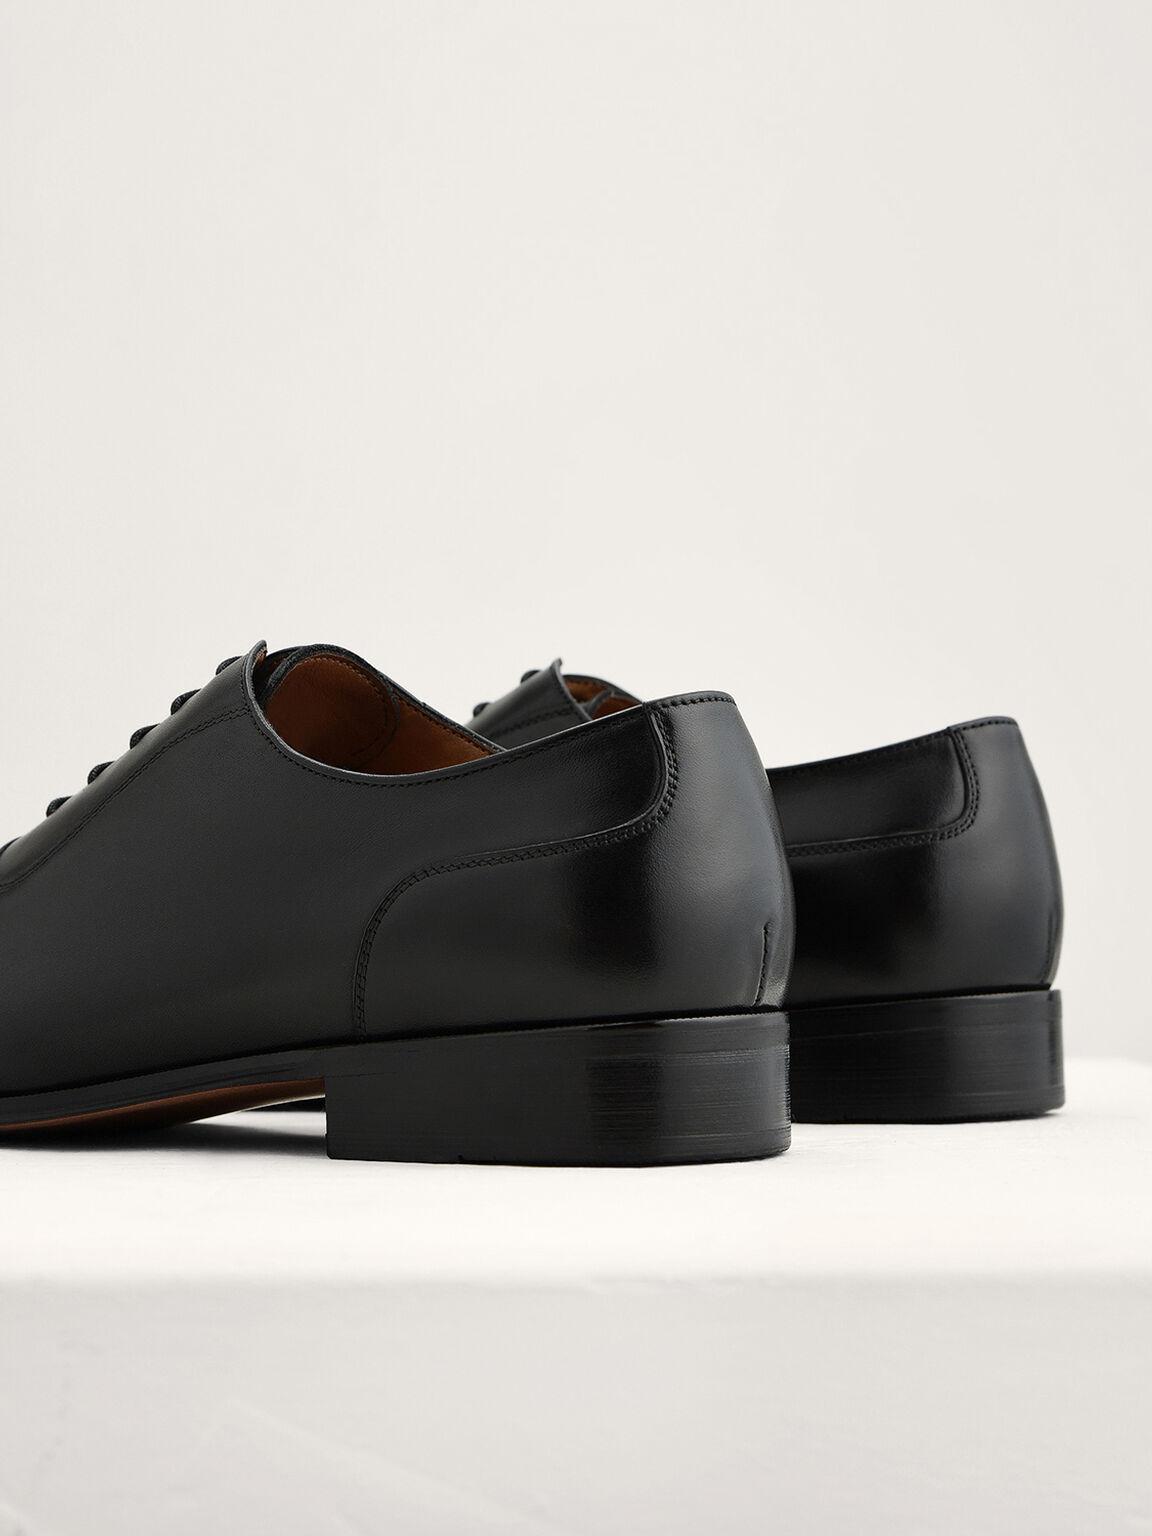 Leather Cap Toe Oxfords, Black, hi-res